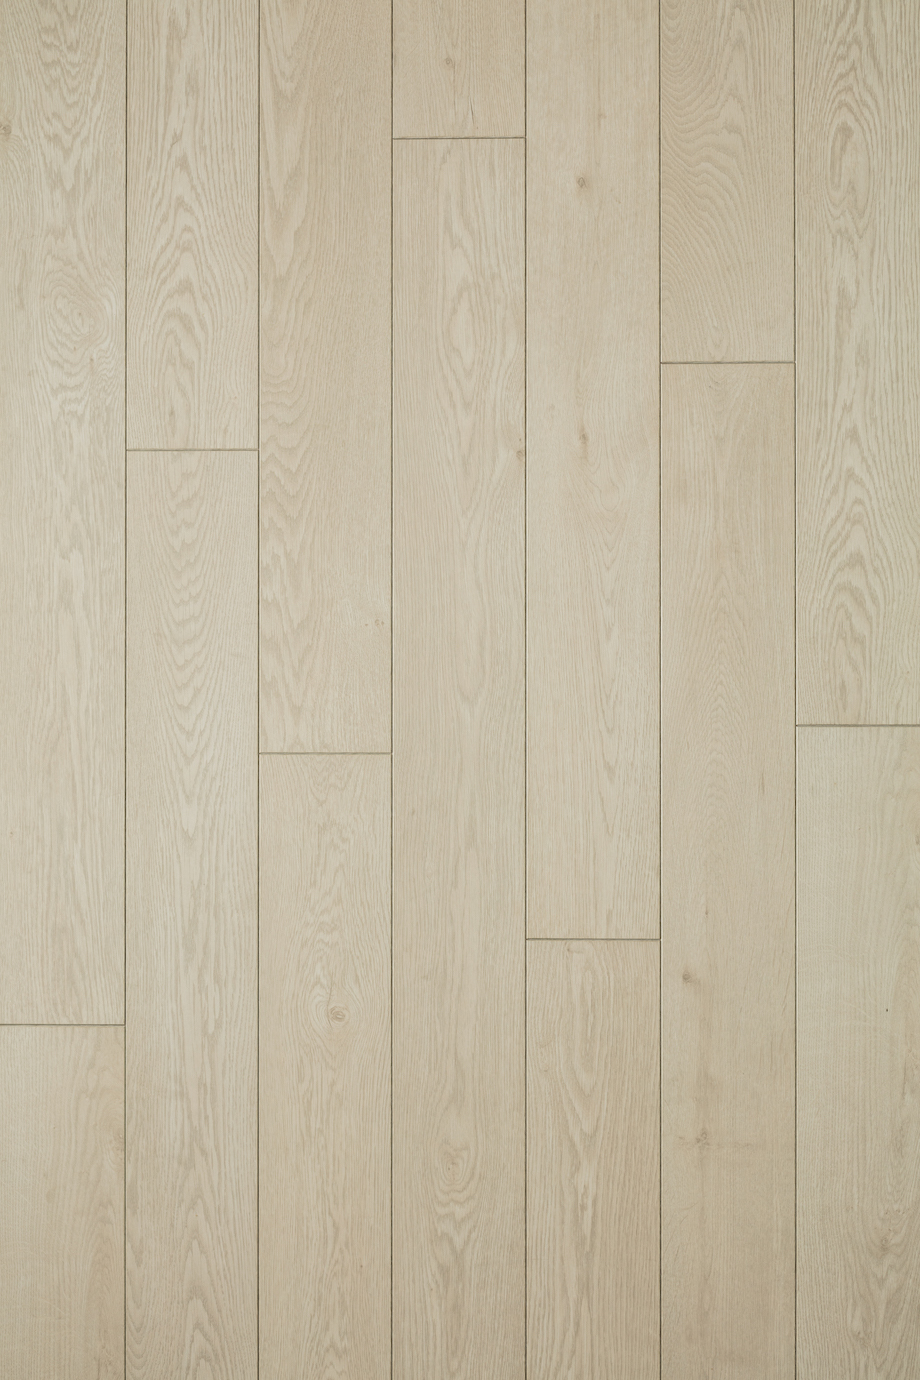 Ламинат Clix Floor Charm 157 Дуб Полар 1261х133х12мм 8шт/уп. (1,342м2) 4V, 33 класс